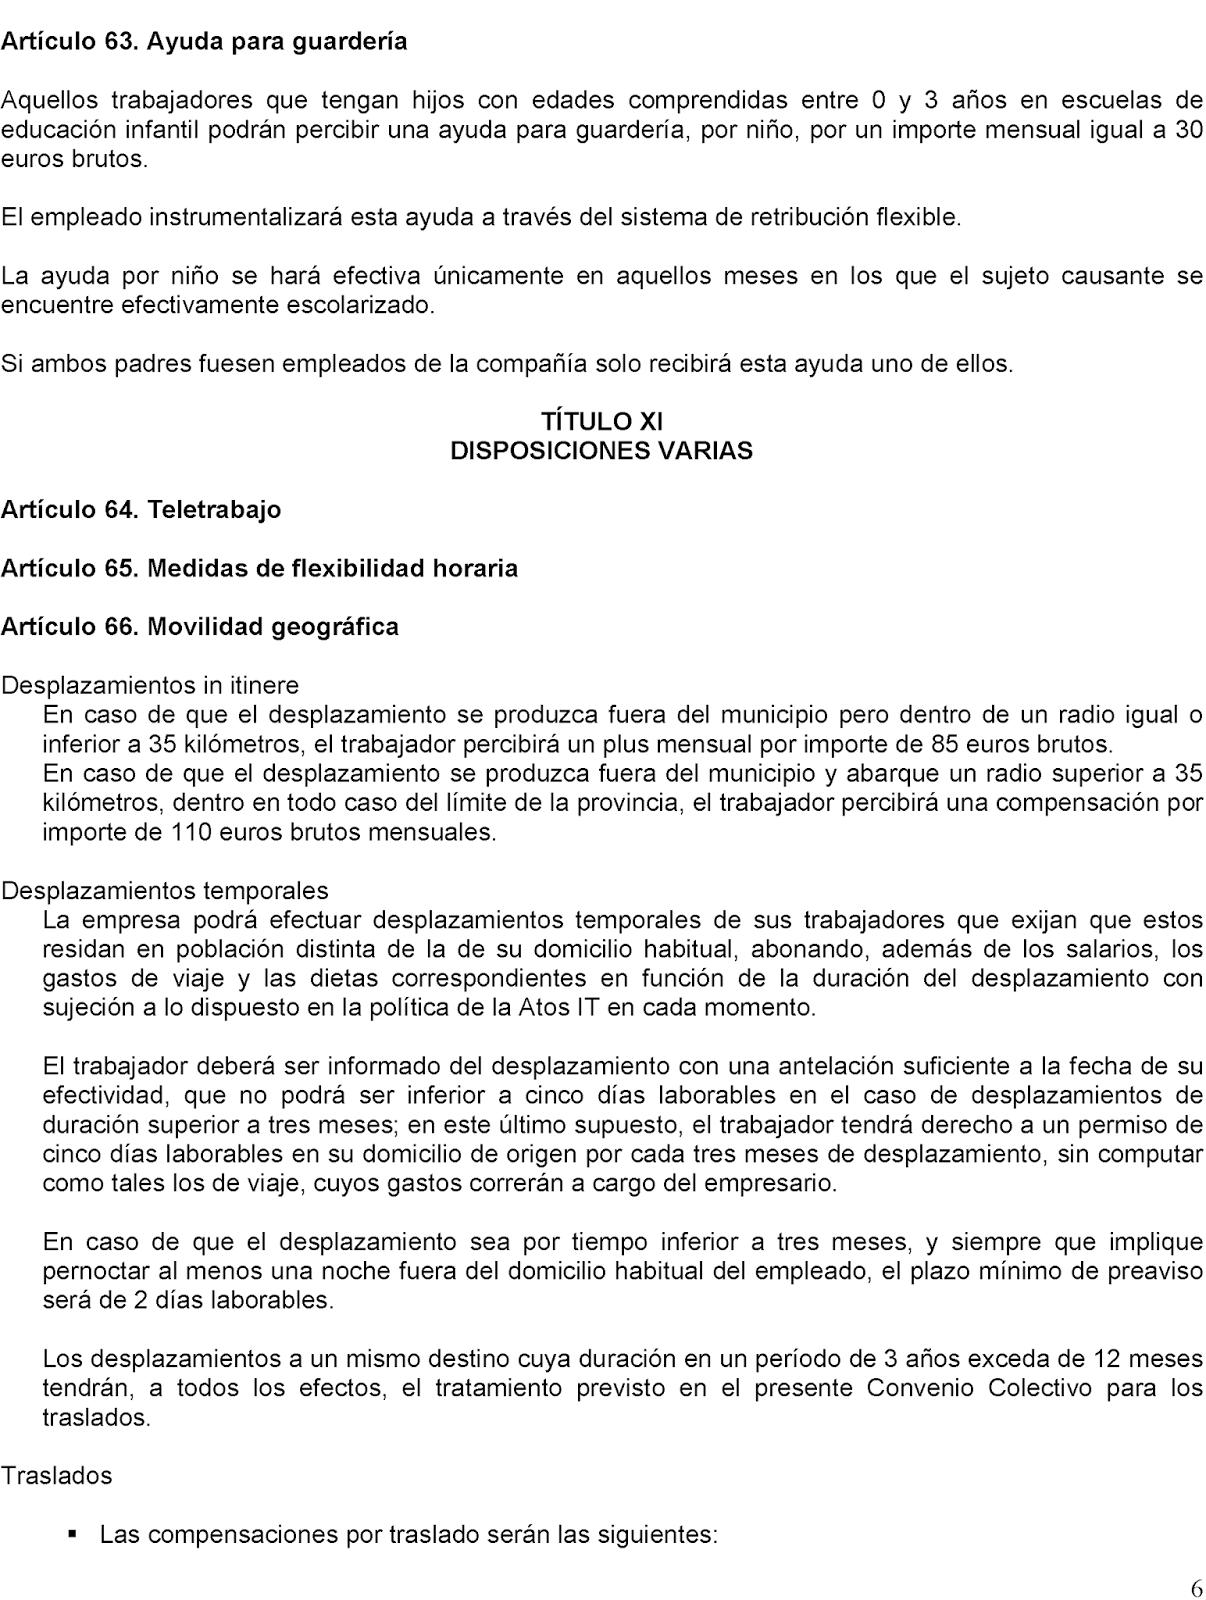 GAtos Sindicales: AtoS IT: I Convenio Colectivo